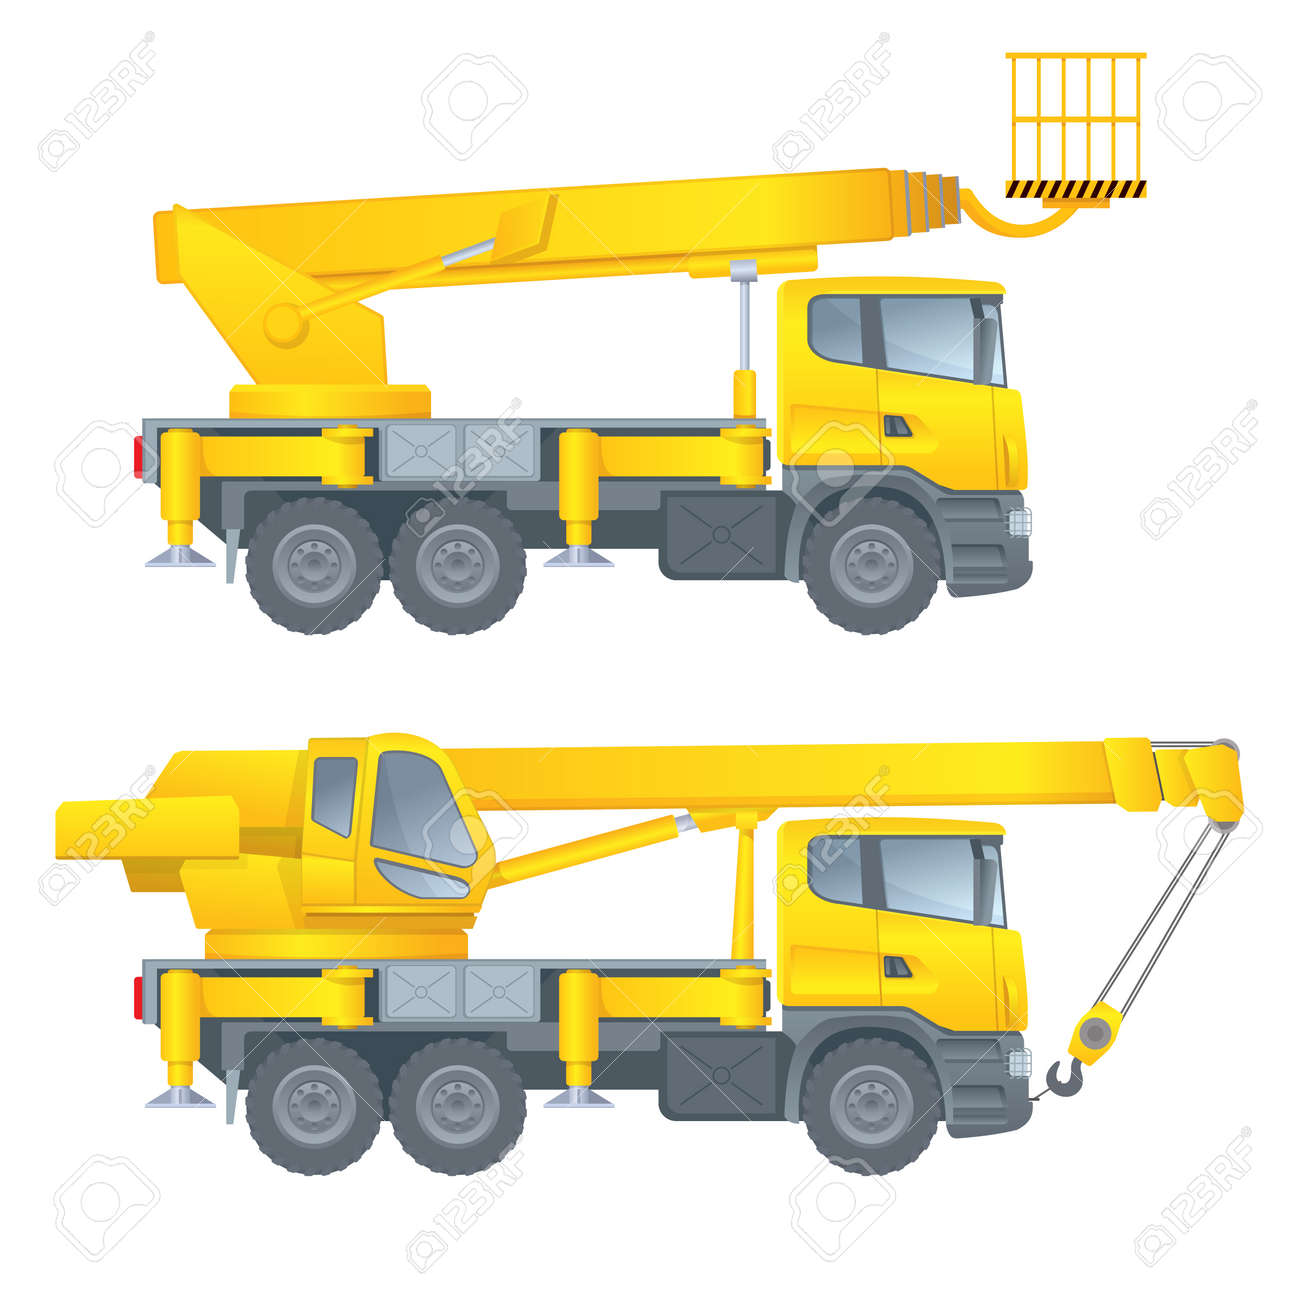 Construction Machinery Truck Crane Car Cradle Aerial Platform Vector Illustration White